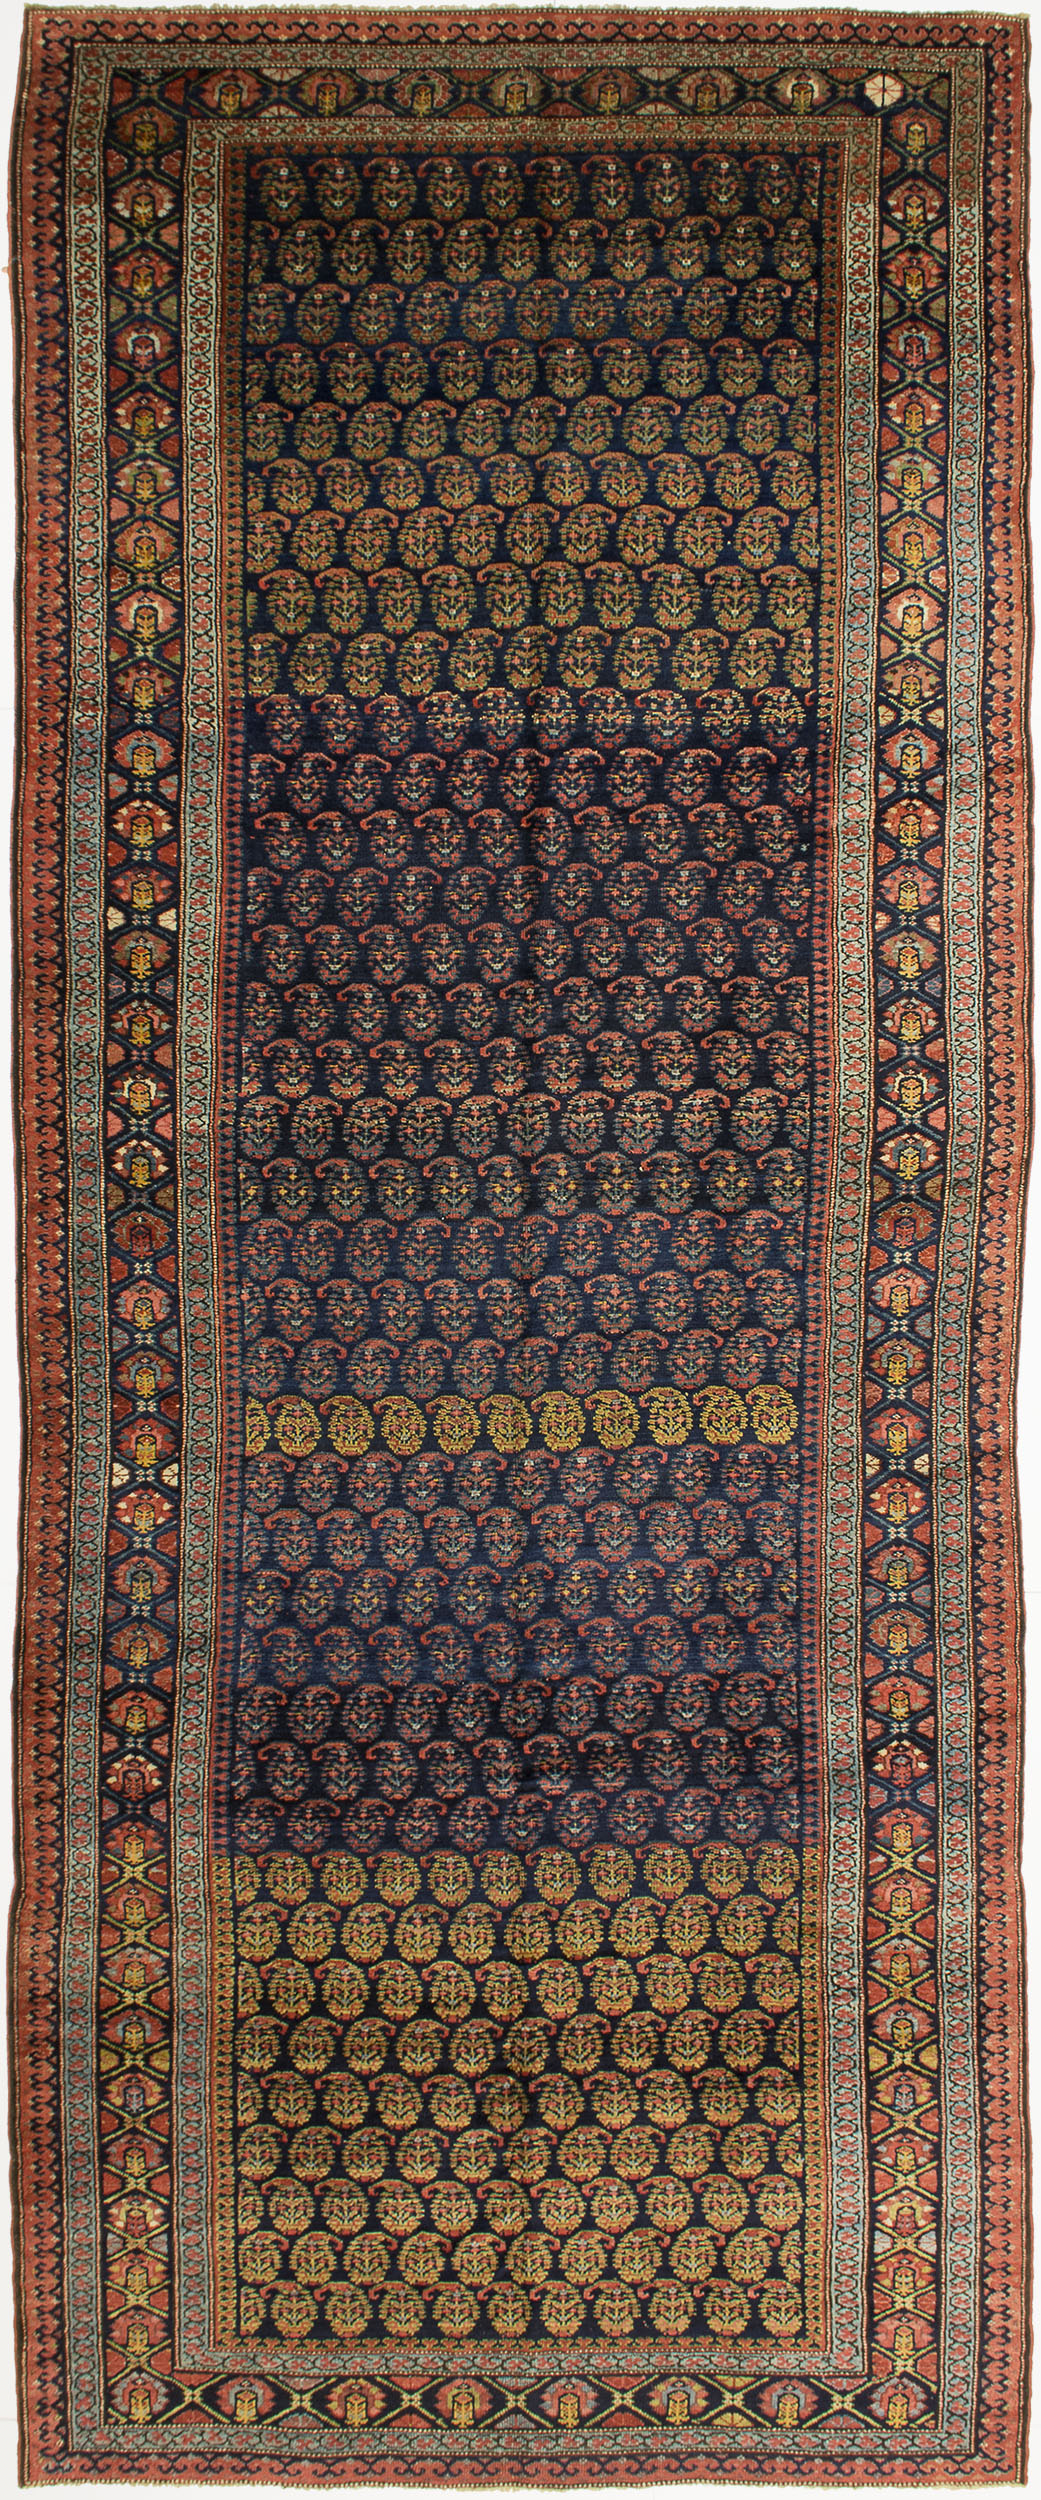 "Kurdish Gallery Carpet 14' 5"" x 5' 8"""